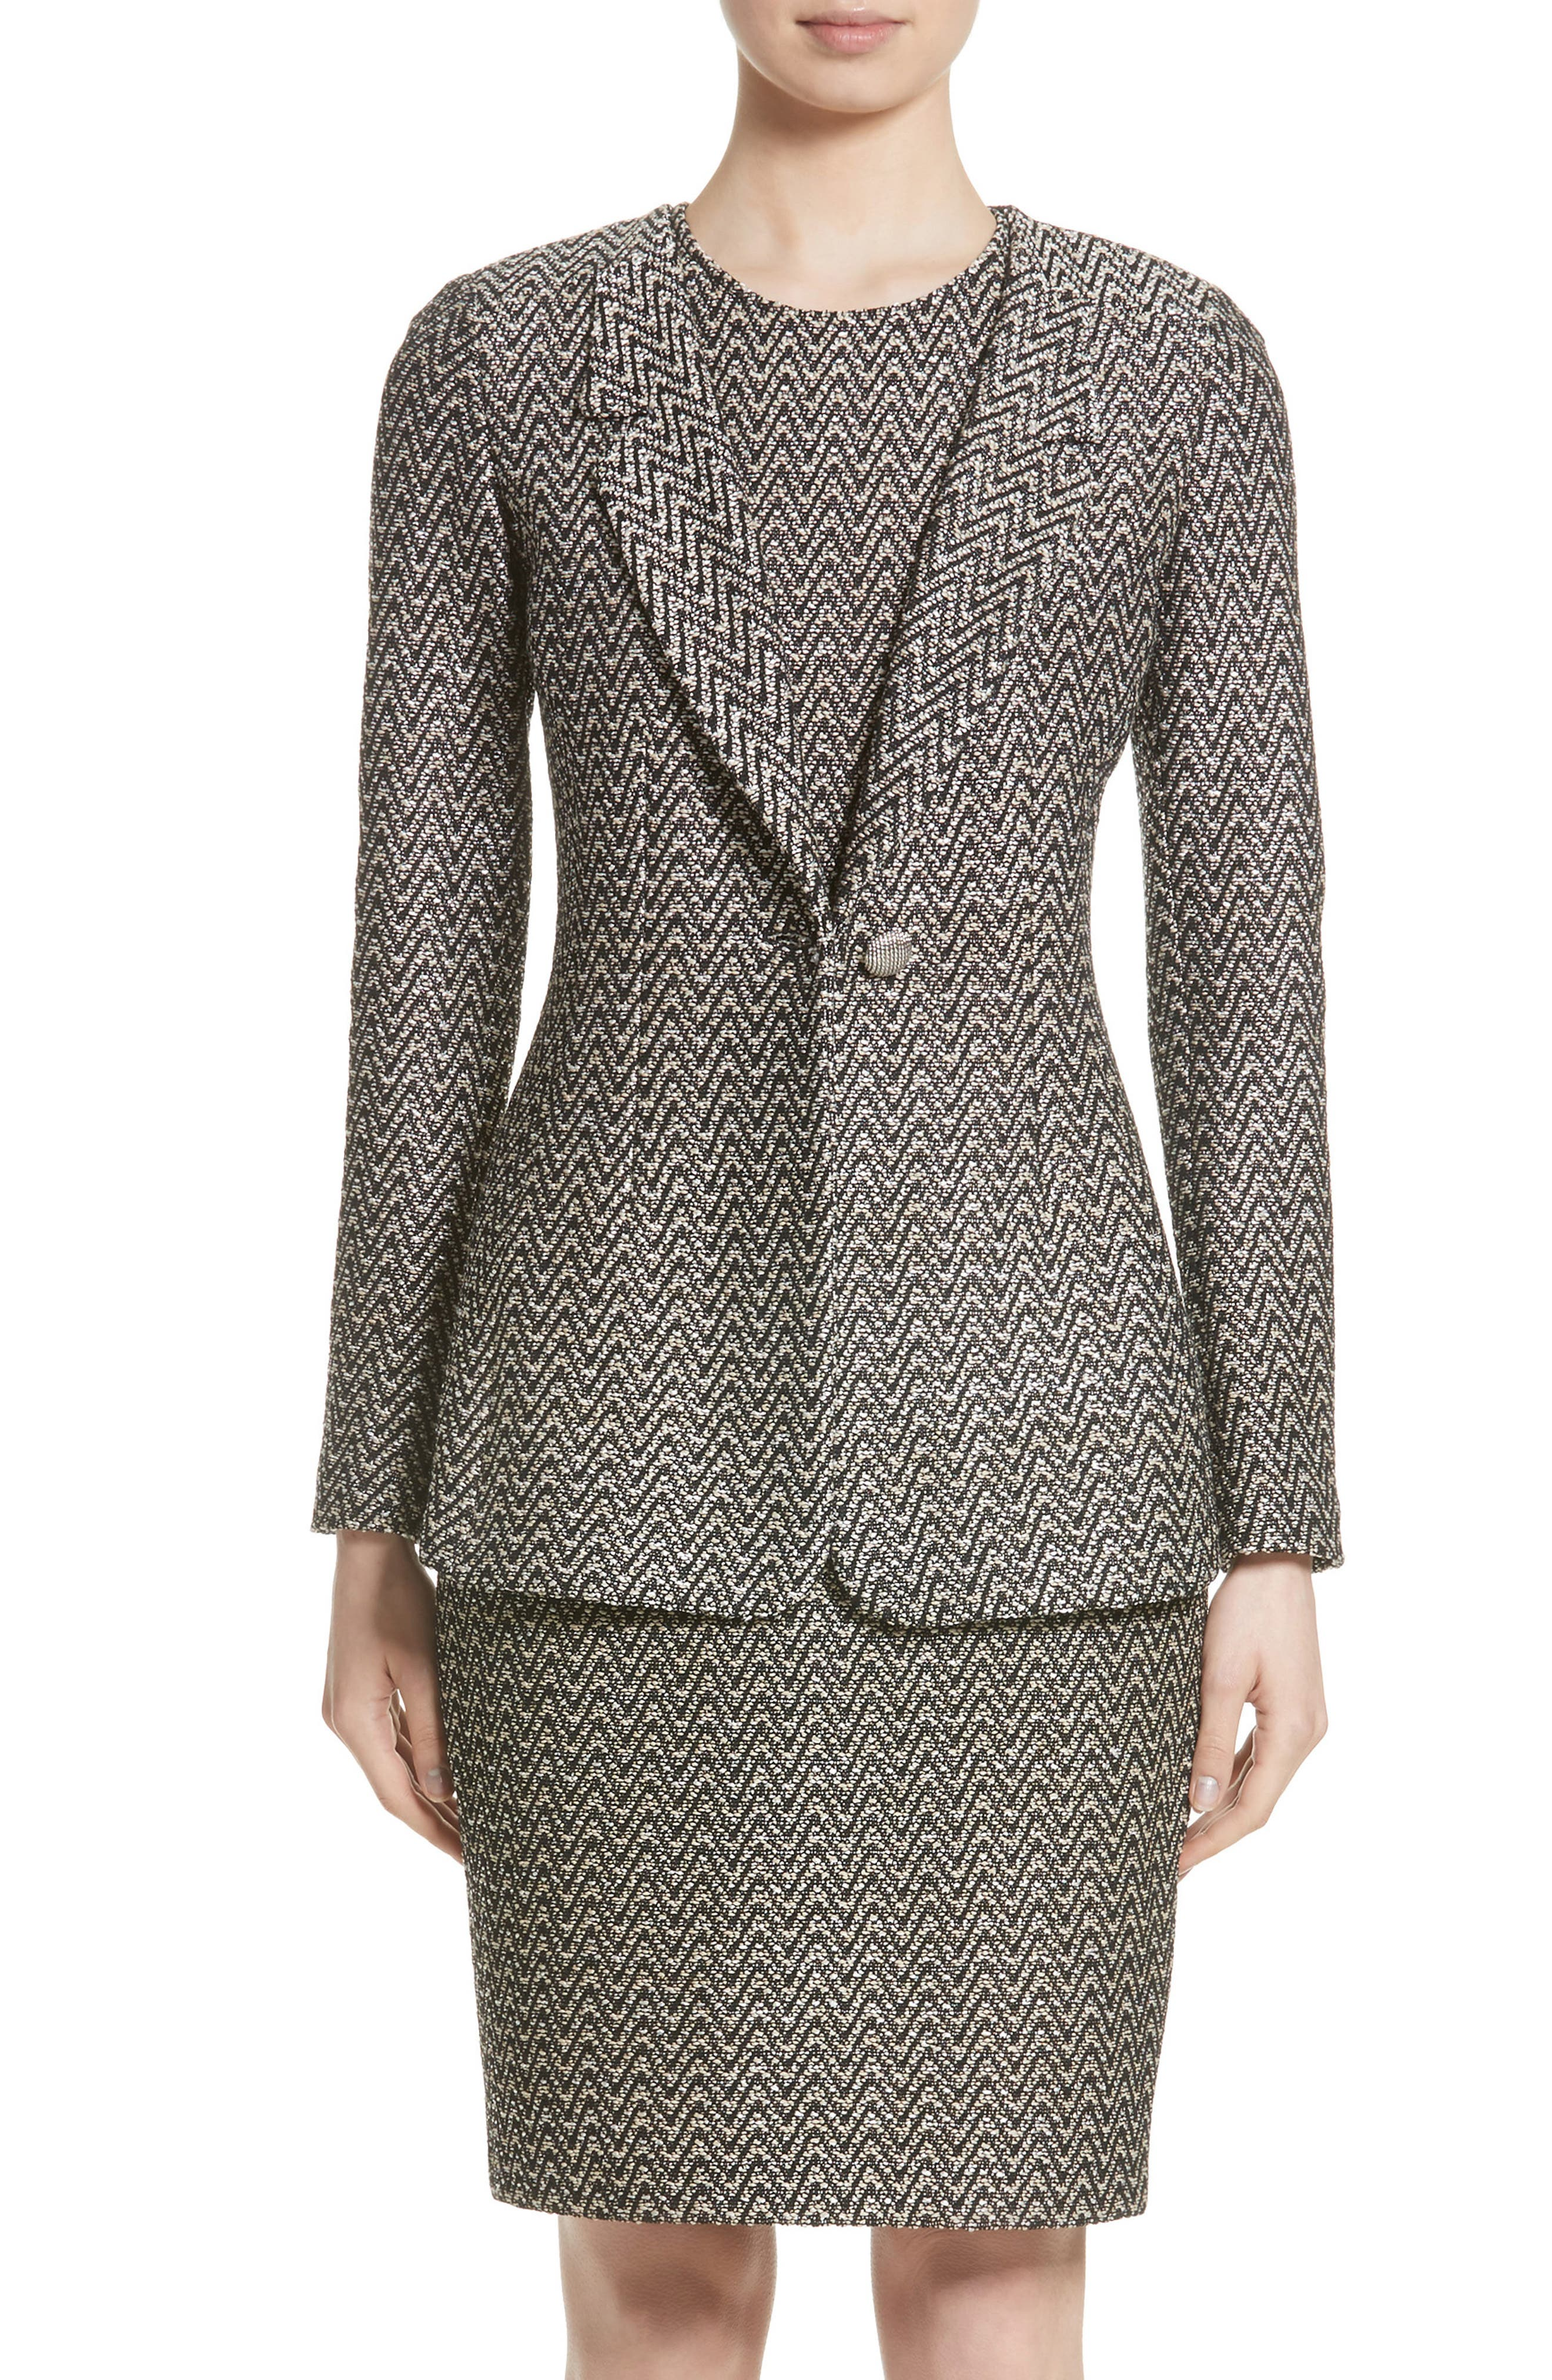 St. John Collection Aluna Speckled Chevron Tweed Knit Jacket (Nordstrom Exclusive)